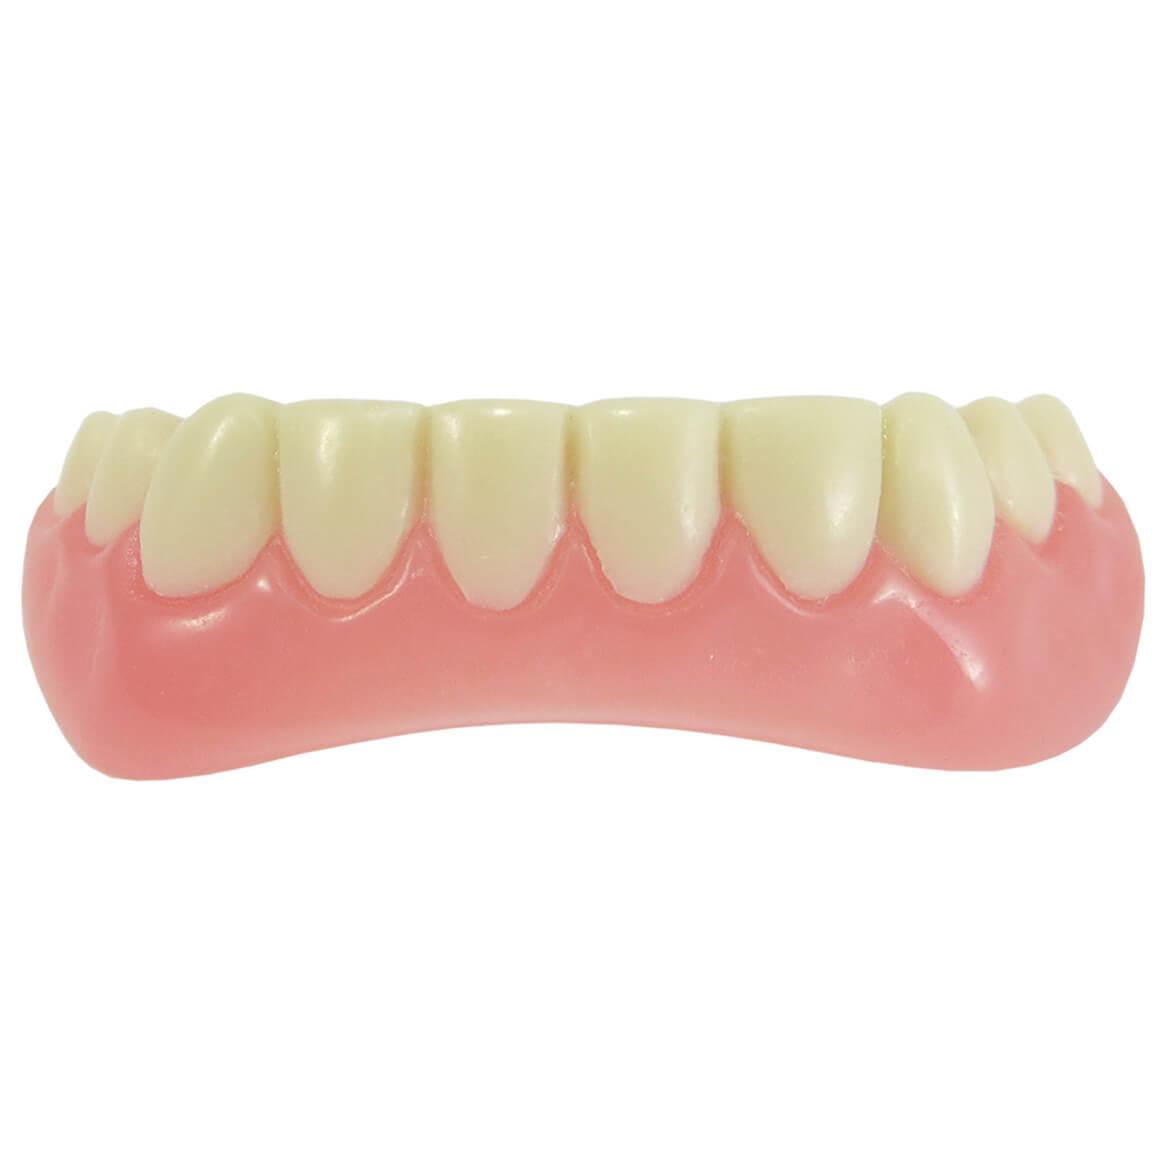 Instant Smile™ Hand Made Lower Veneer Natural White-371254